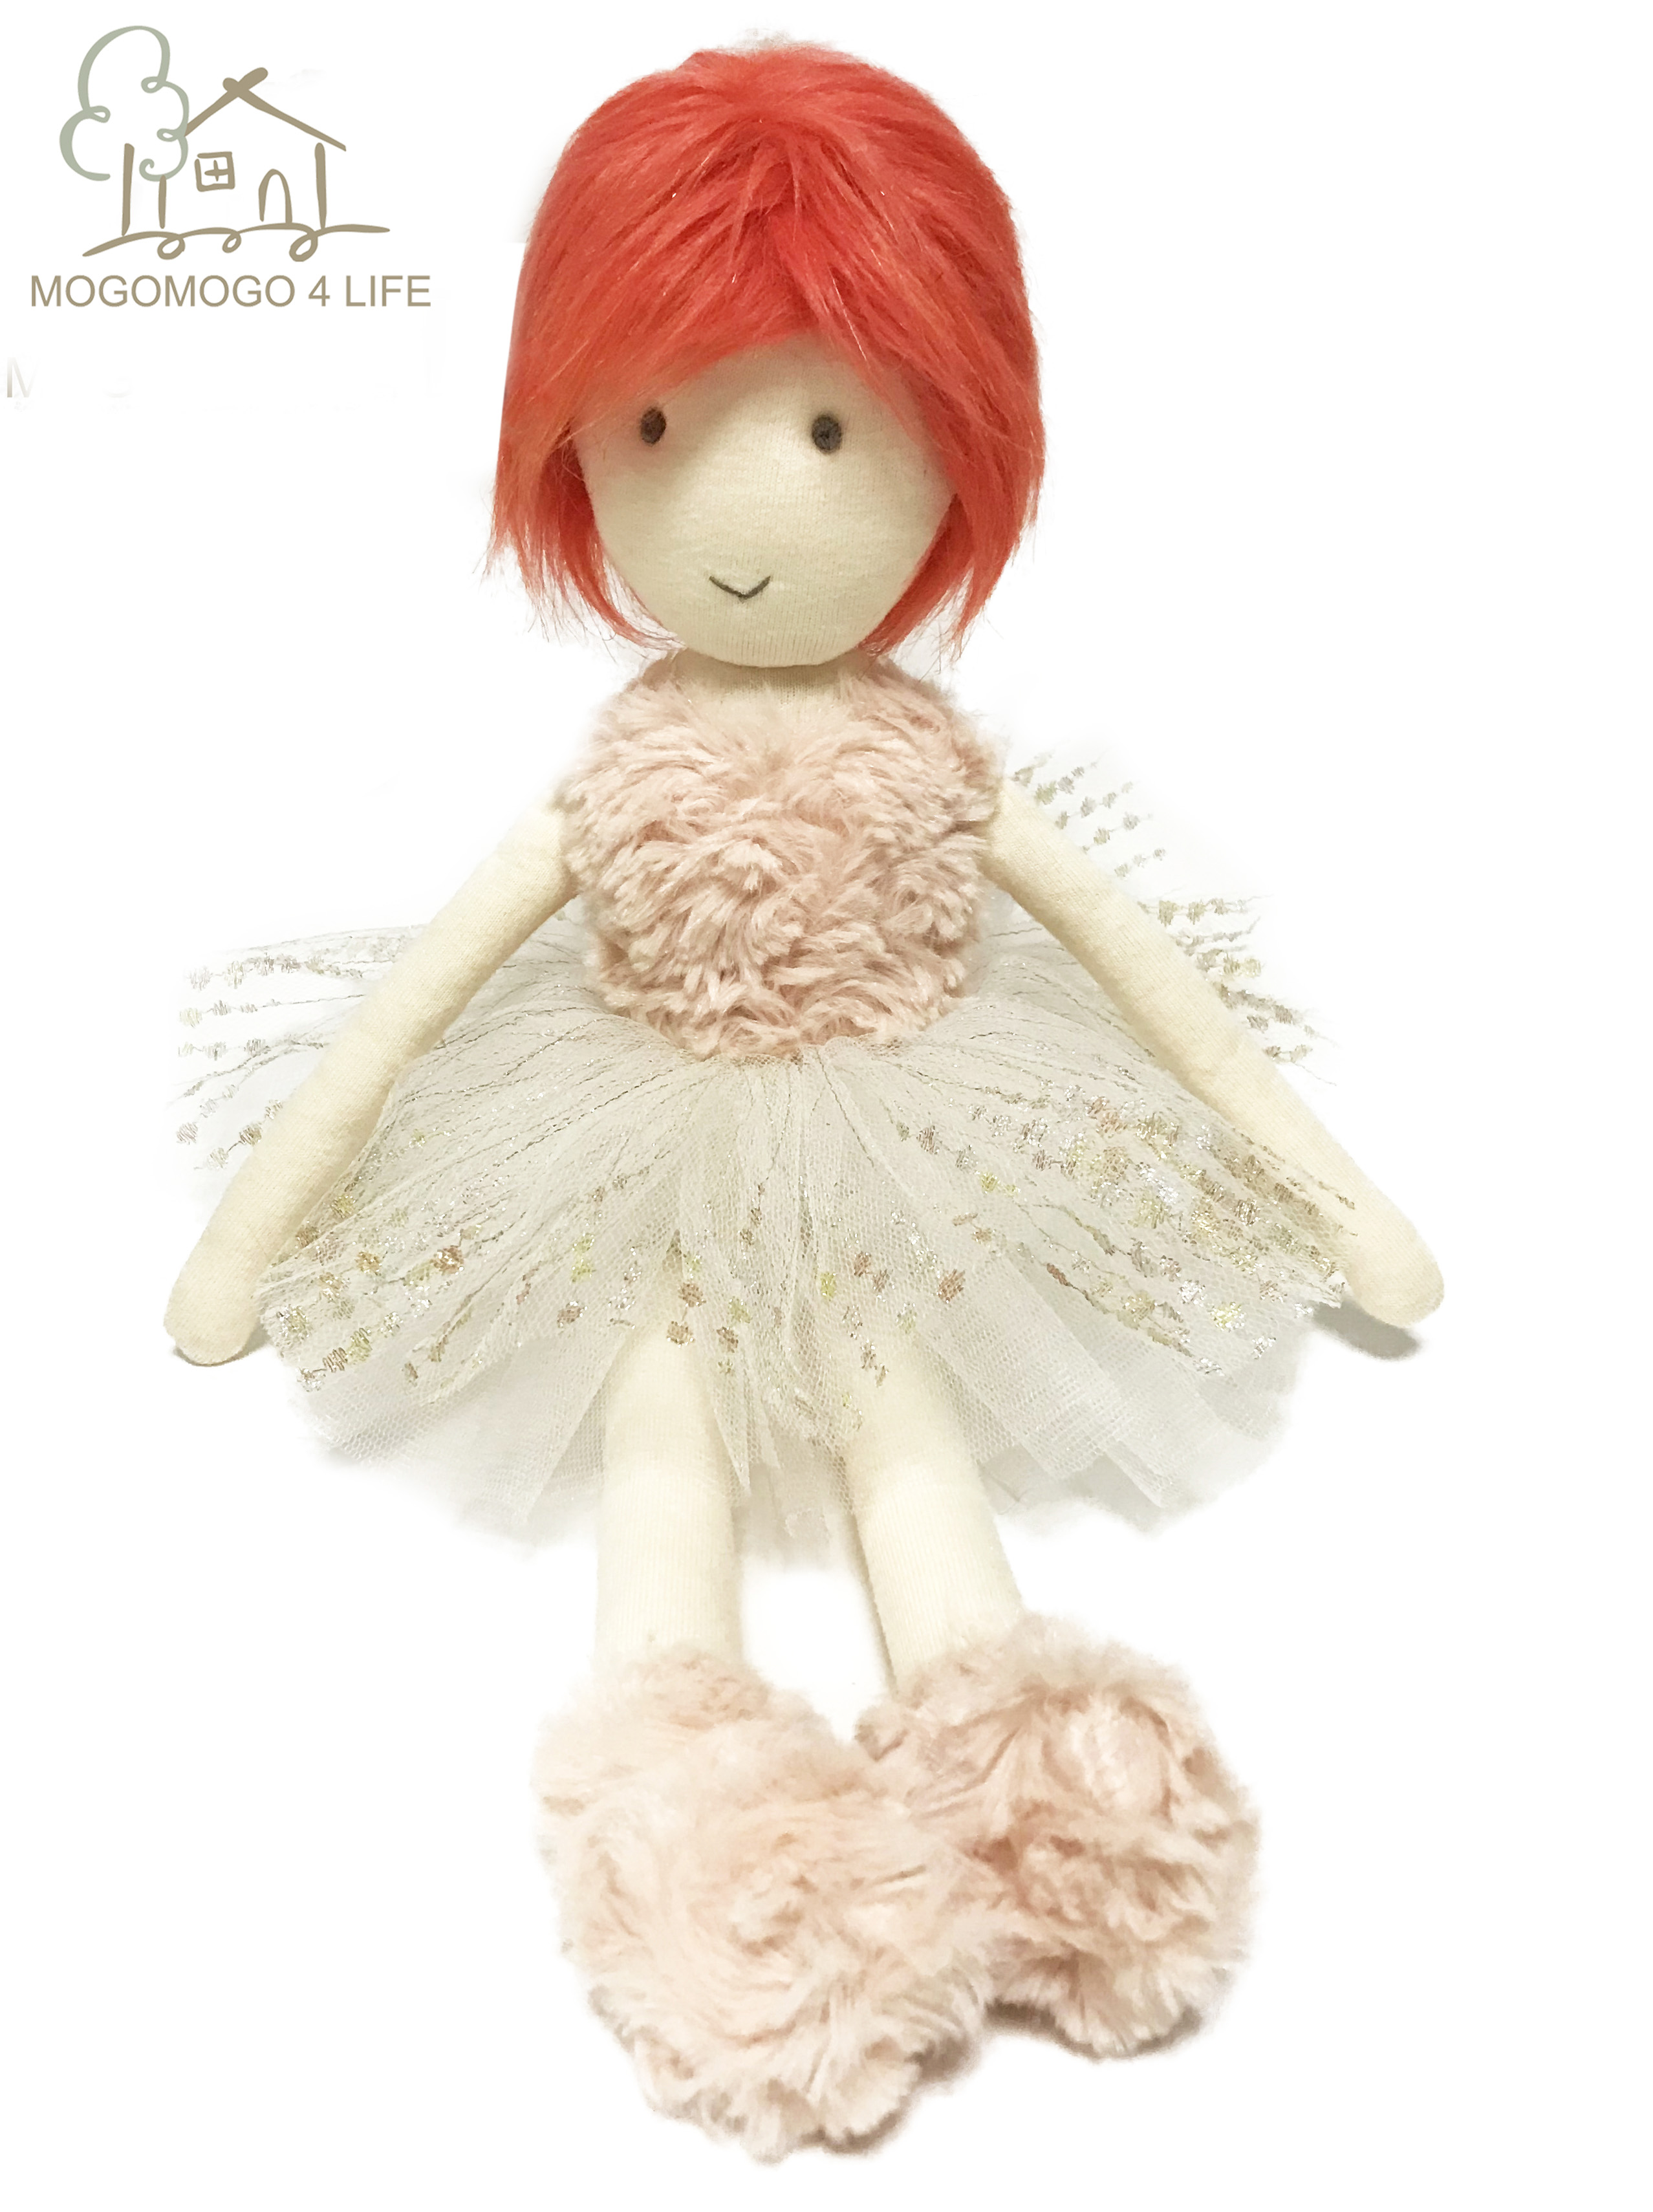 Luxury Handmade Stuffed Girl Plush Toys With Red Hair Premium Present Option Fashion Pink Ballerina Girl Doll Princess Girl Doll